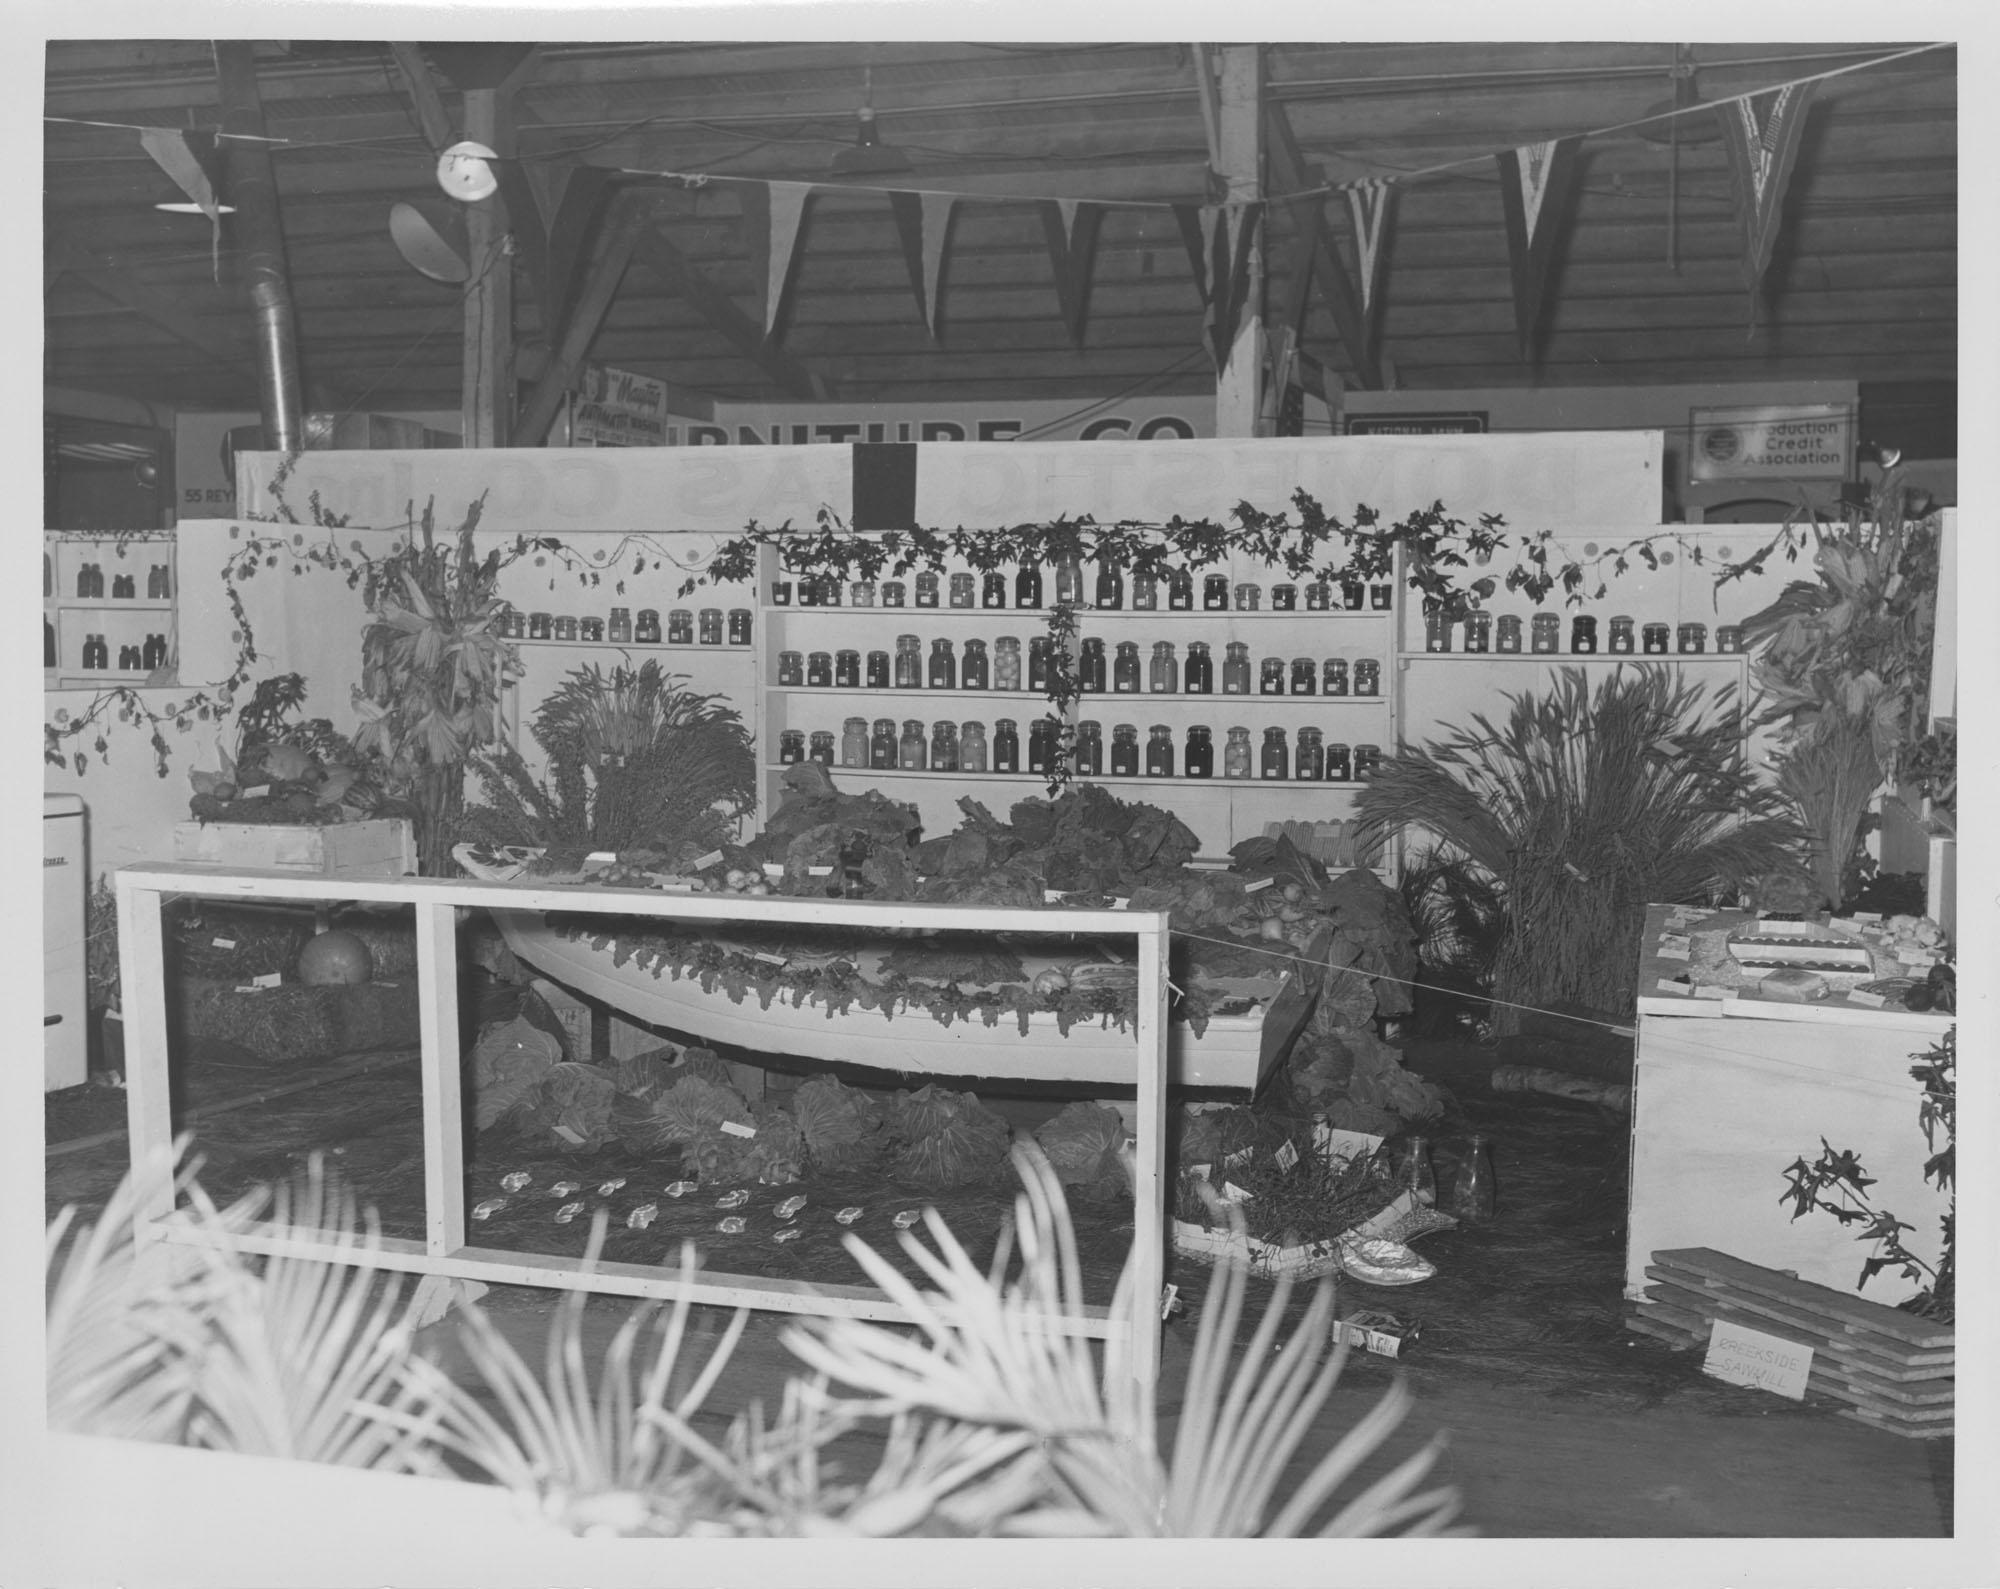 Fair Exhibit featuring Creekside Sawmill